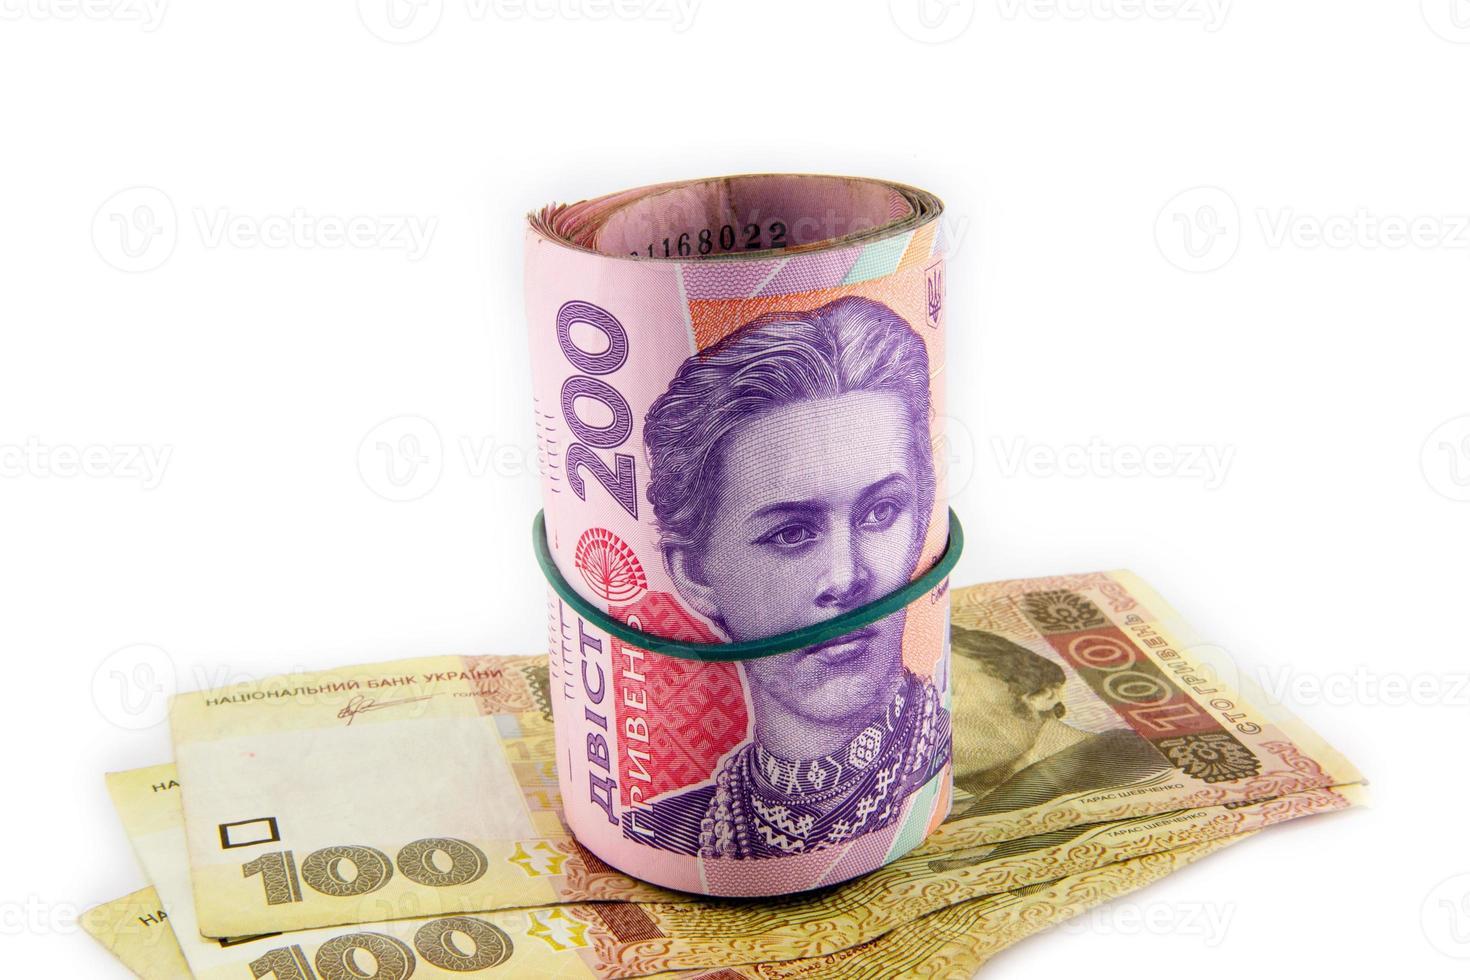 hryvnia ucraniano fechar-se foto